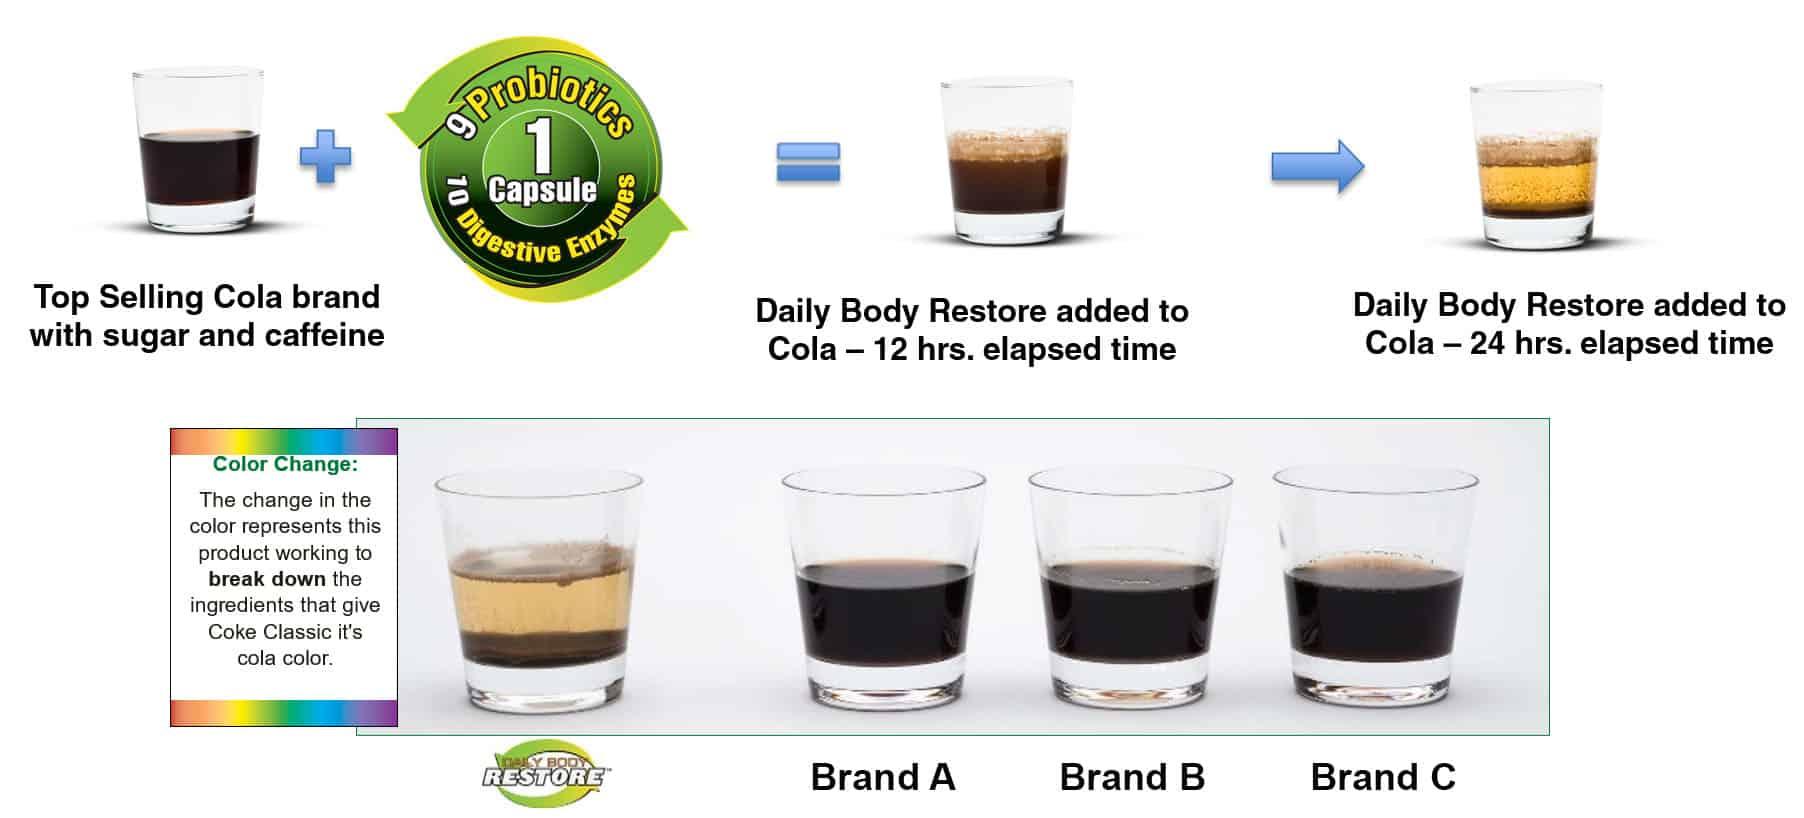 Cola Challenge compares Probiotics